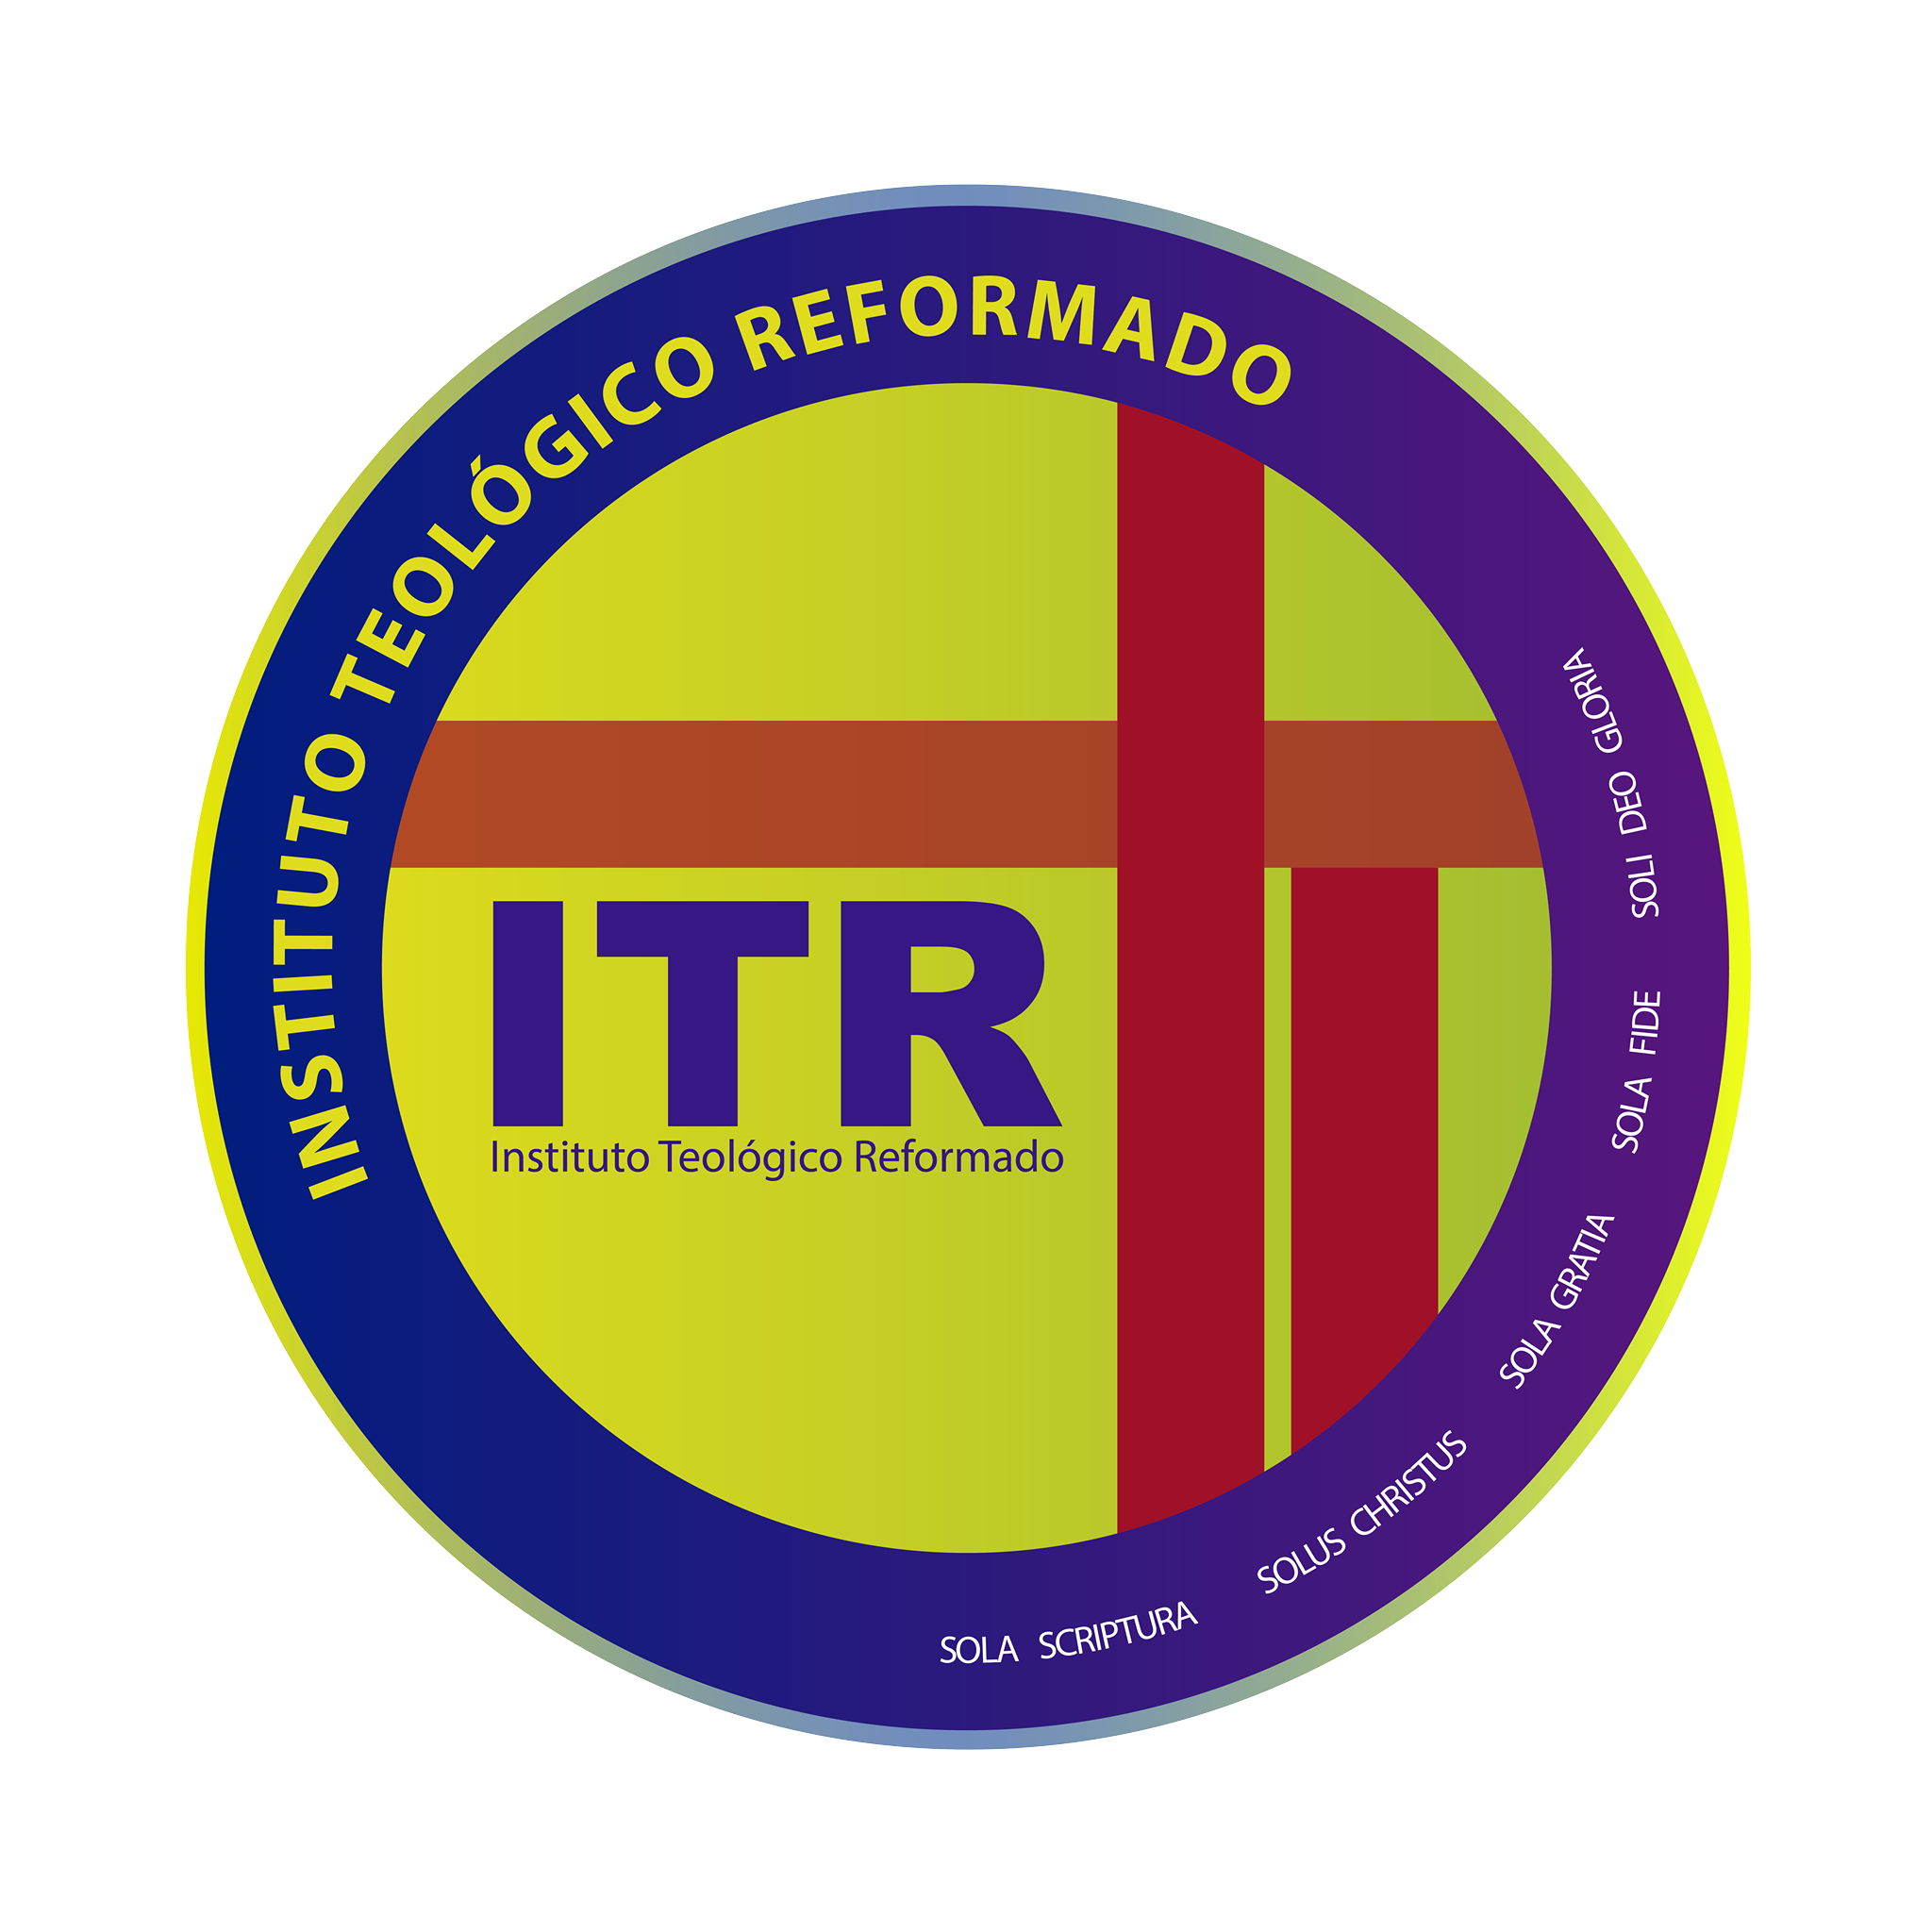 Instituto Teológico Reformado